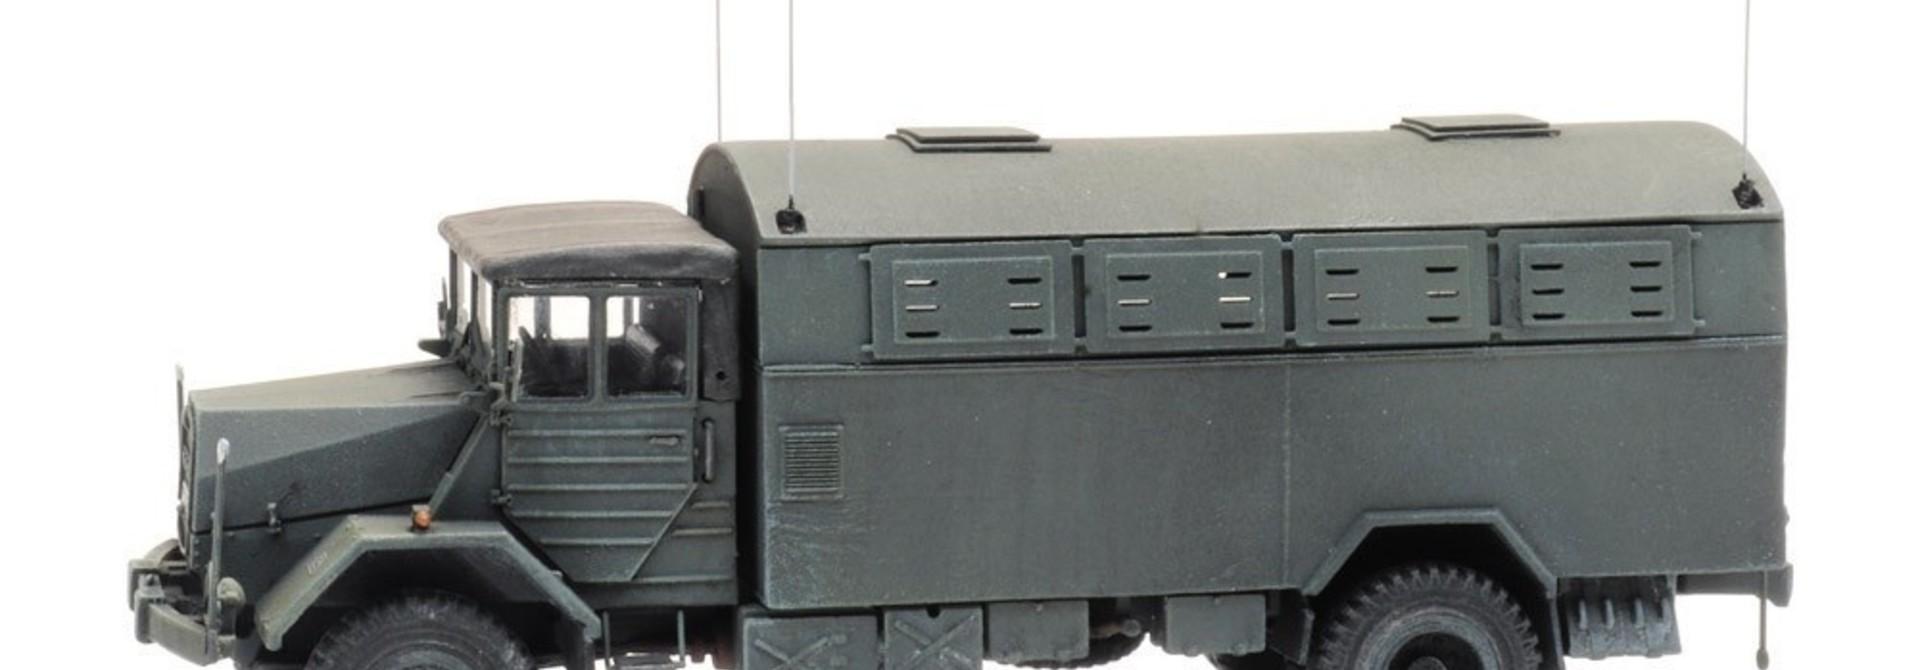 6870417 BRD MAN 630 L2 A mit  Fernmelde Kofferaufbau